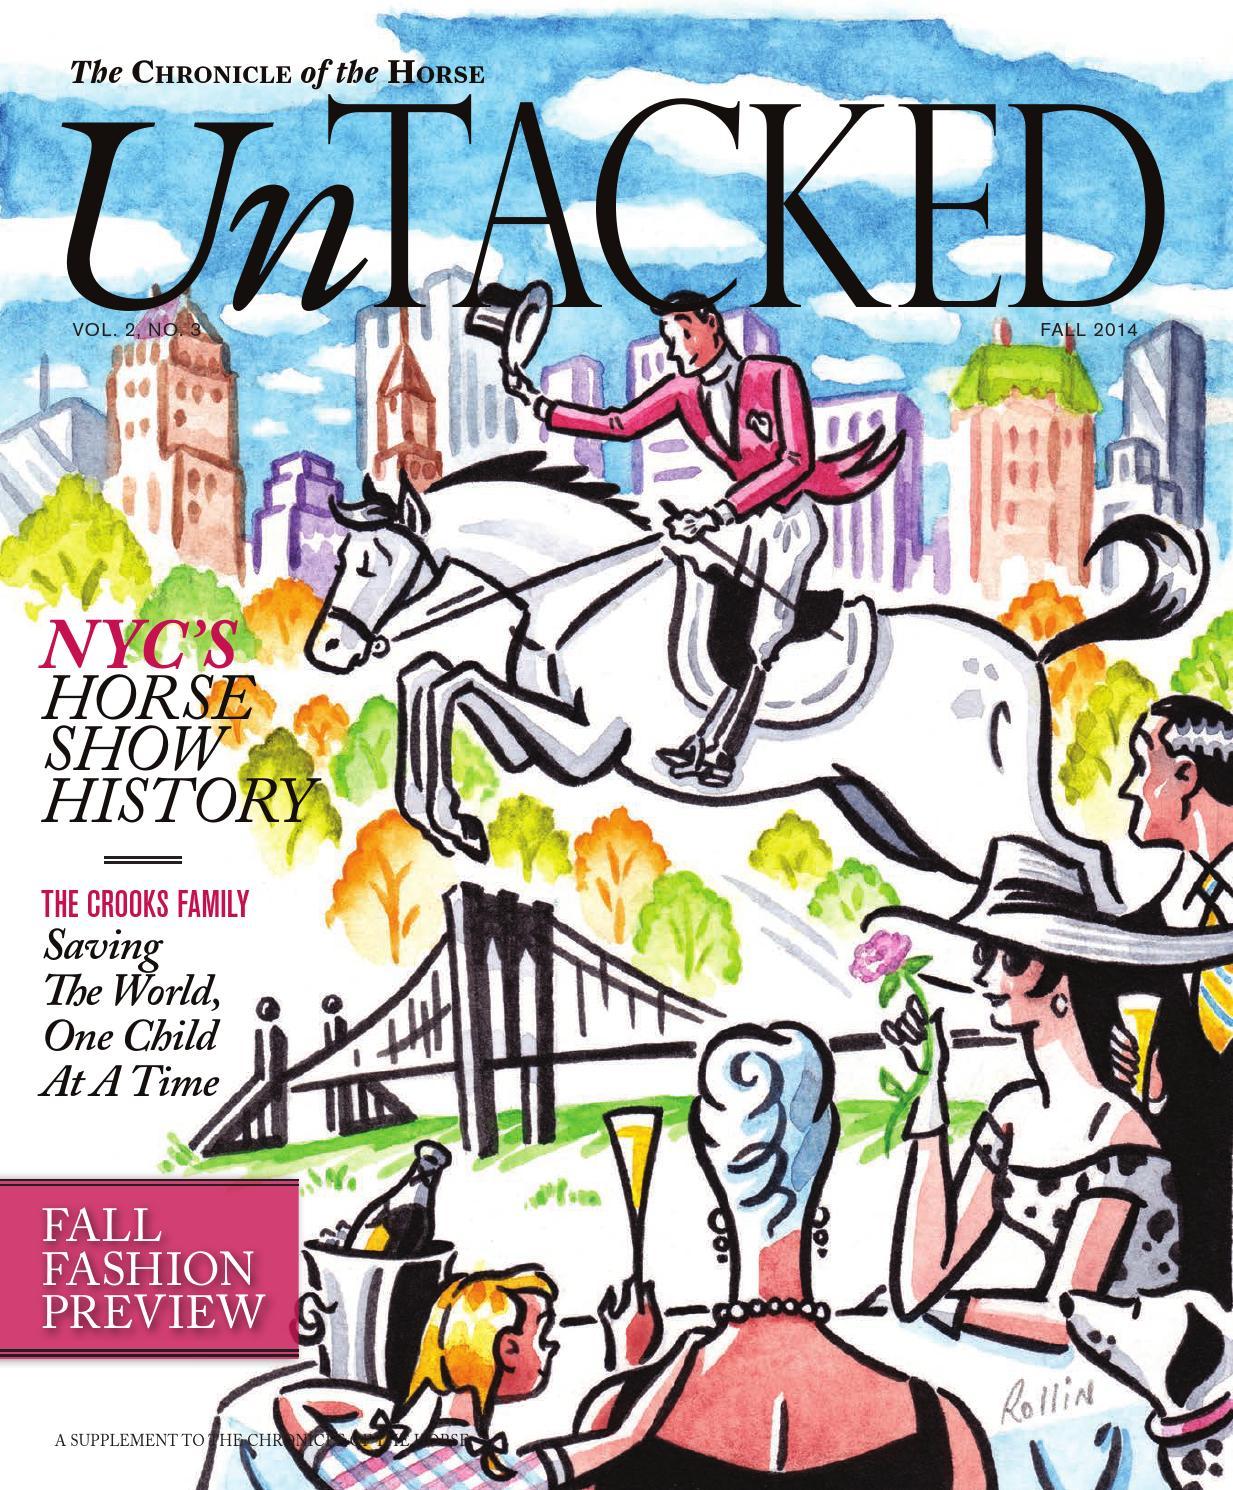 745258daf Untacked fall 2014 by HRCS - issuu